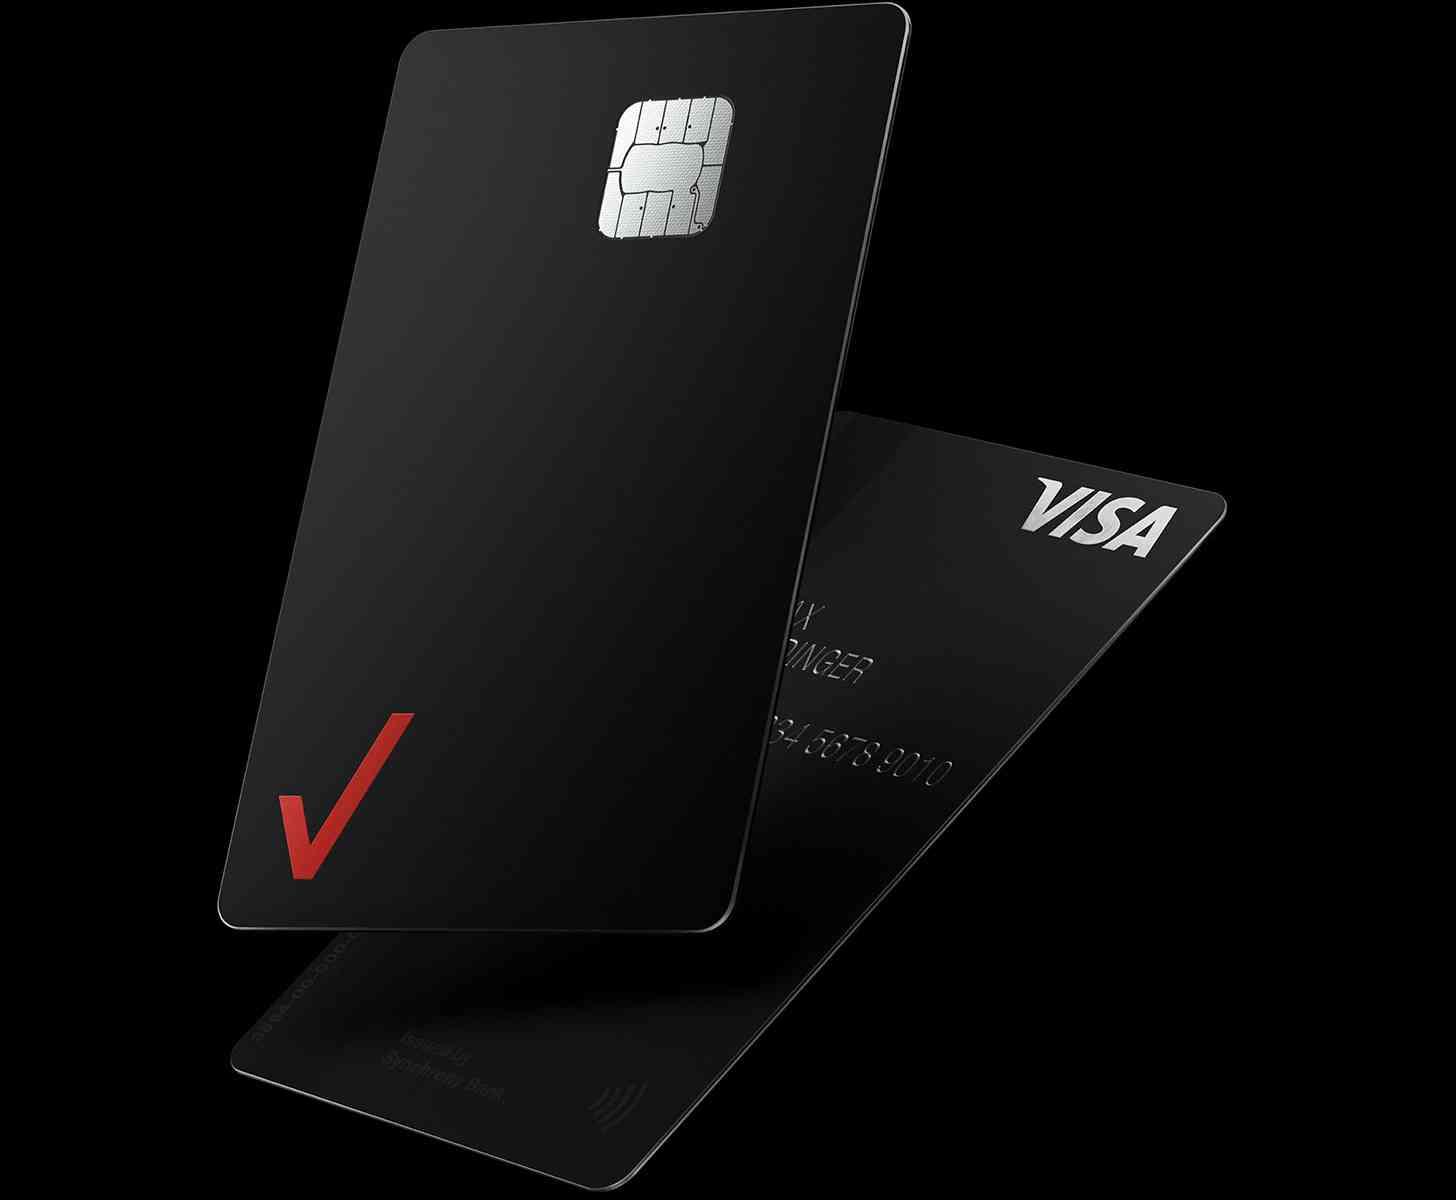 Verizon Visa Card official